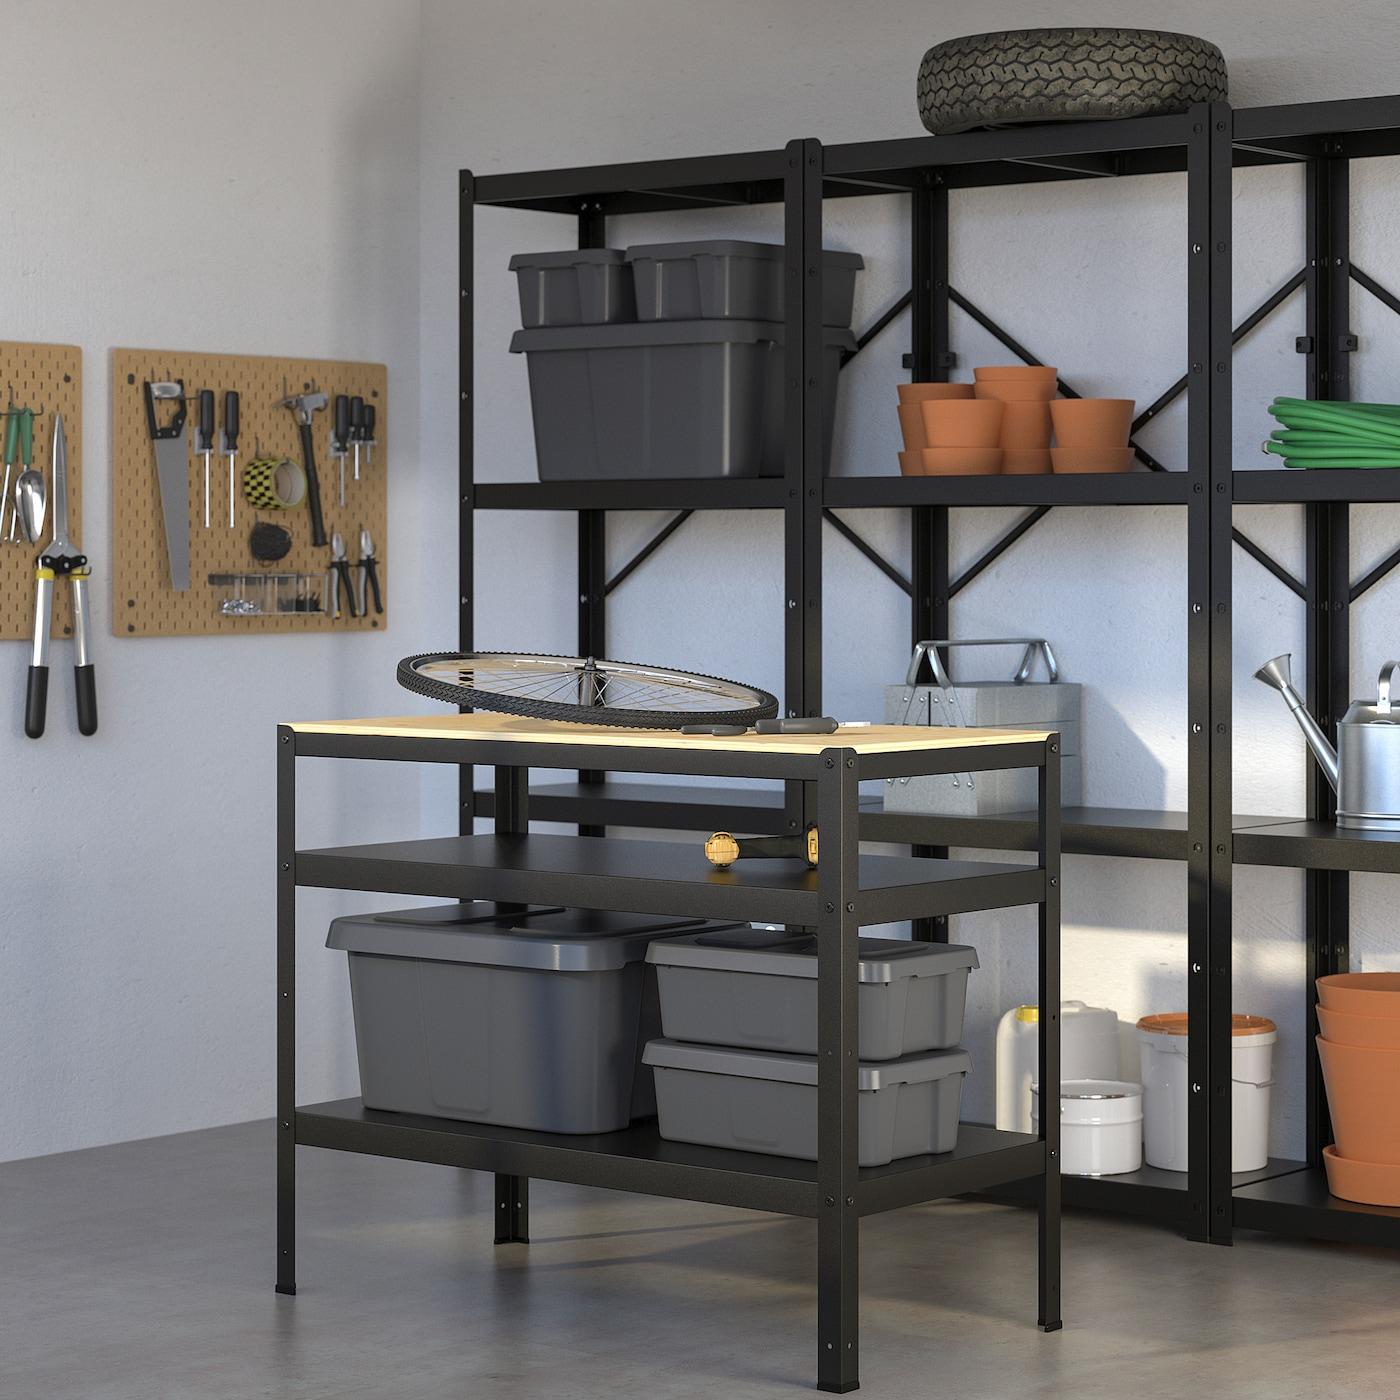 BROR werkbank zwart/grenen triplex 110 cm 55 cm 88 cm 60 kg